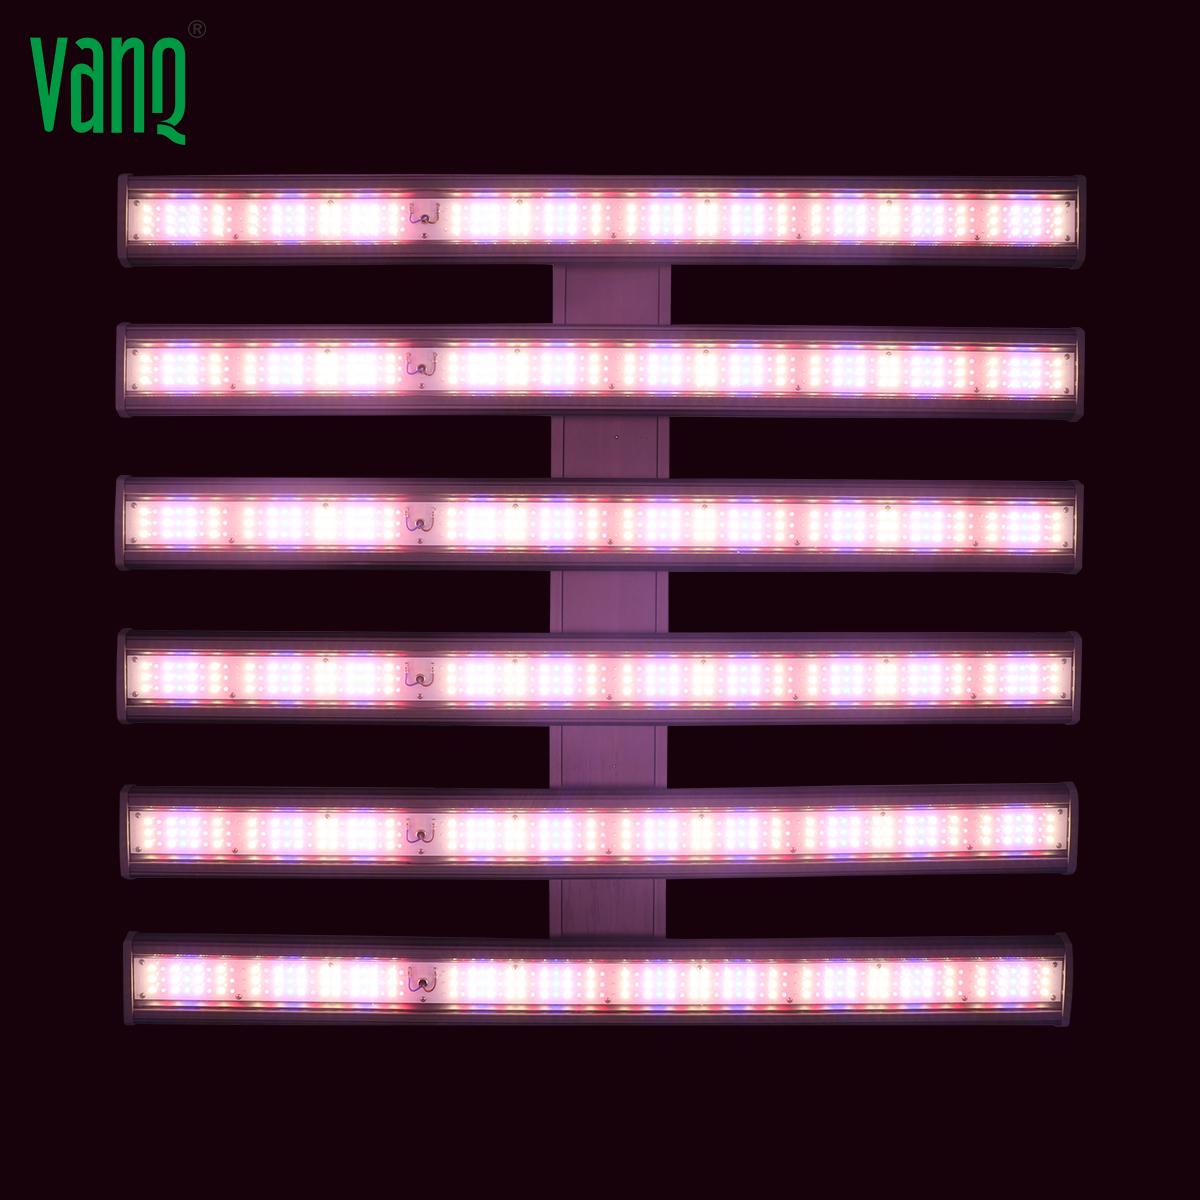 High Power 720W Indoor Grow Lamp Hydroponic LED Plant Grow Light Walmart